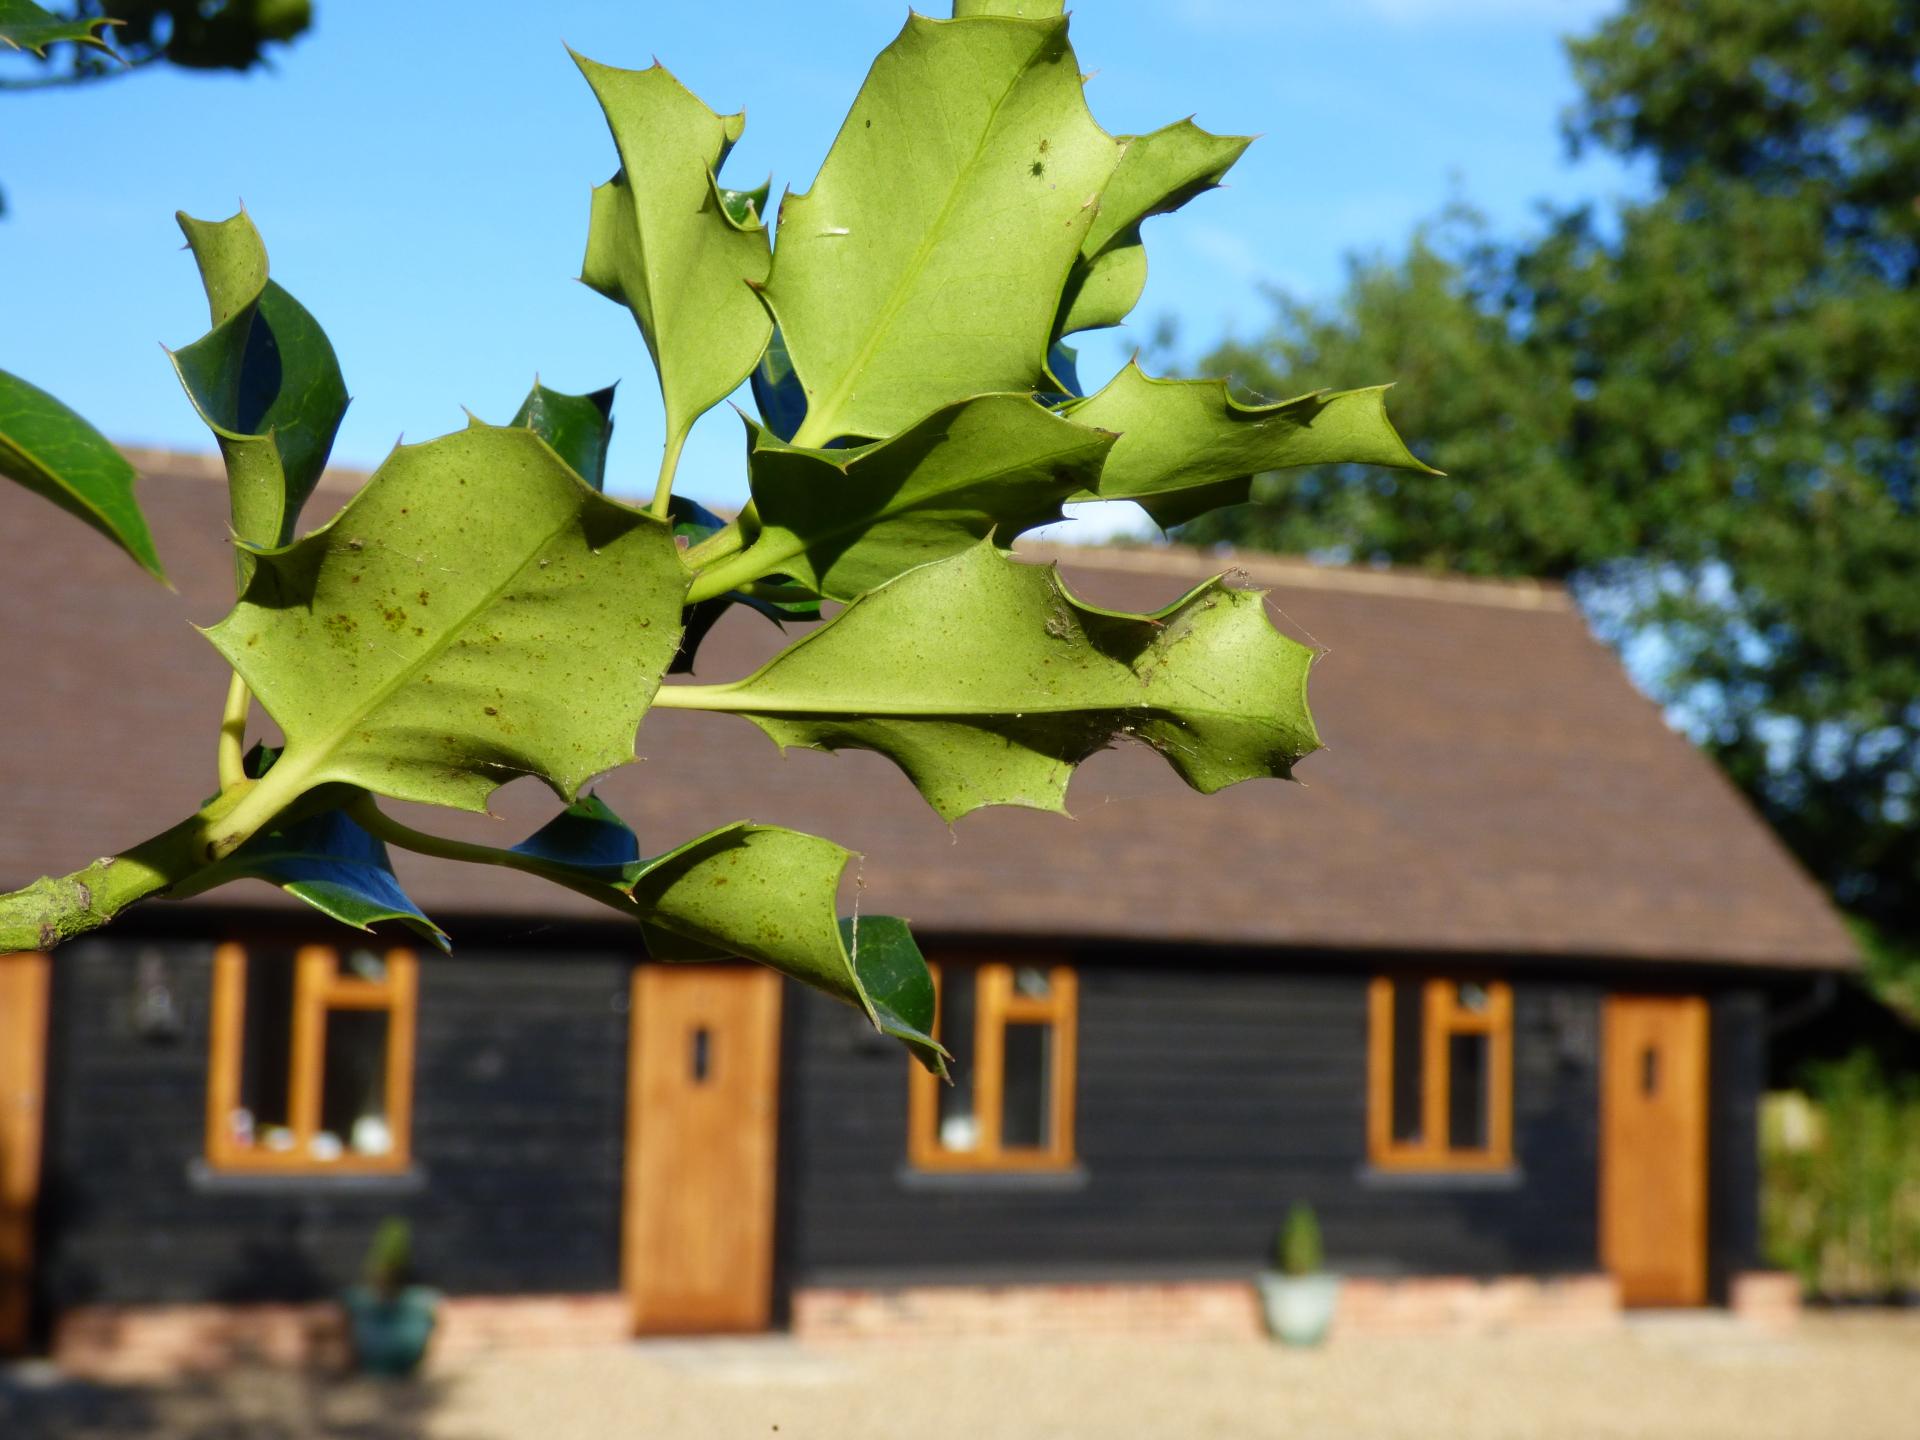 exterior view through ivy